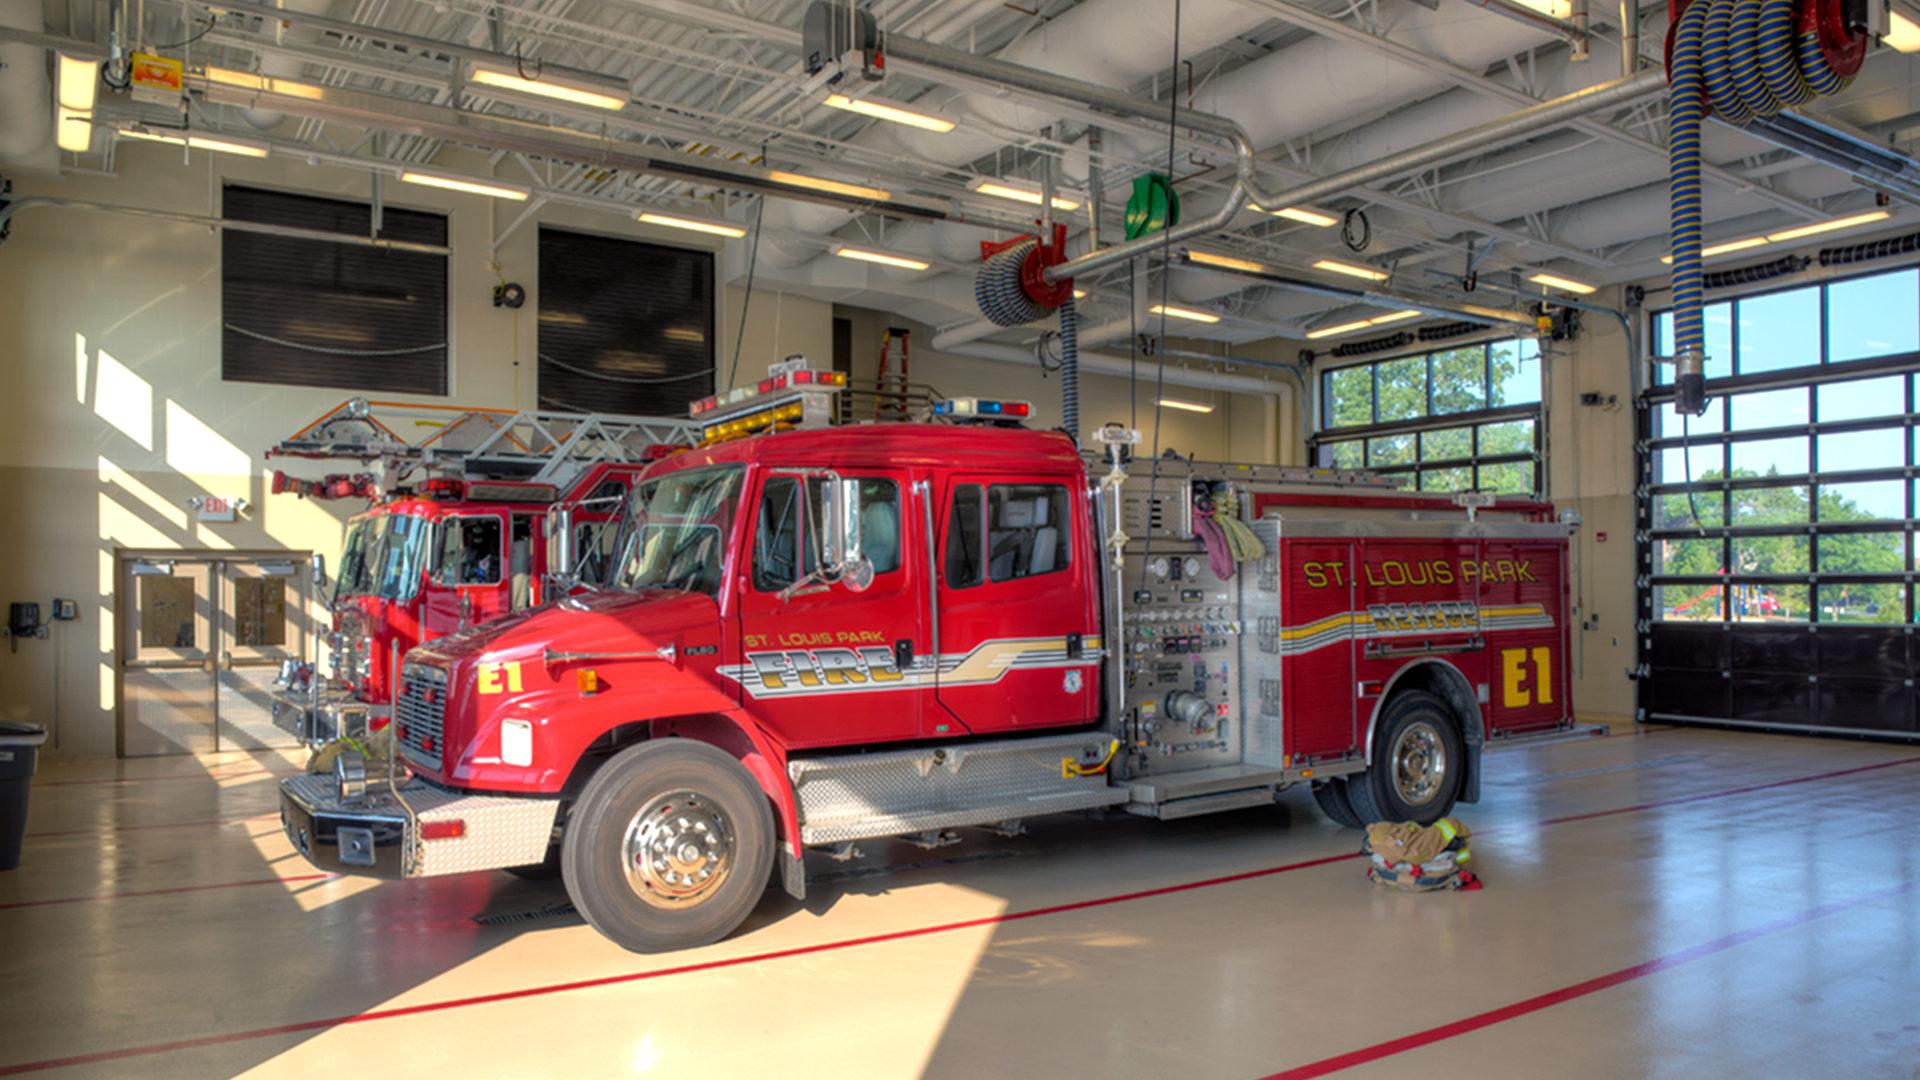 St Louis Park Fire Station 1 St Louis Park MN Fire Trucks Parked in Garage